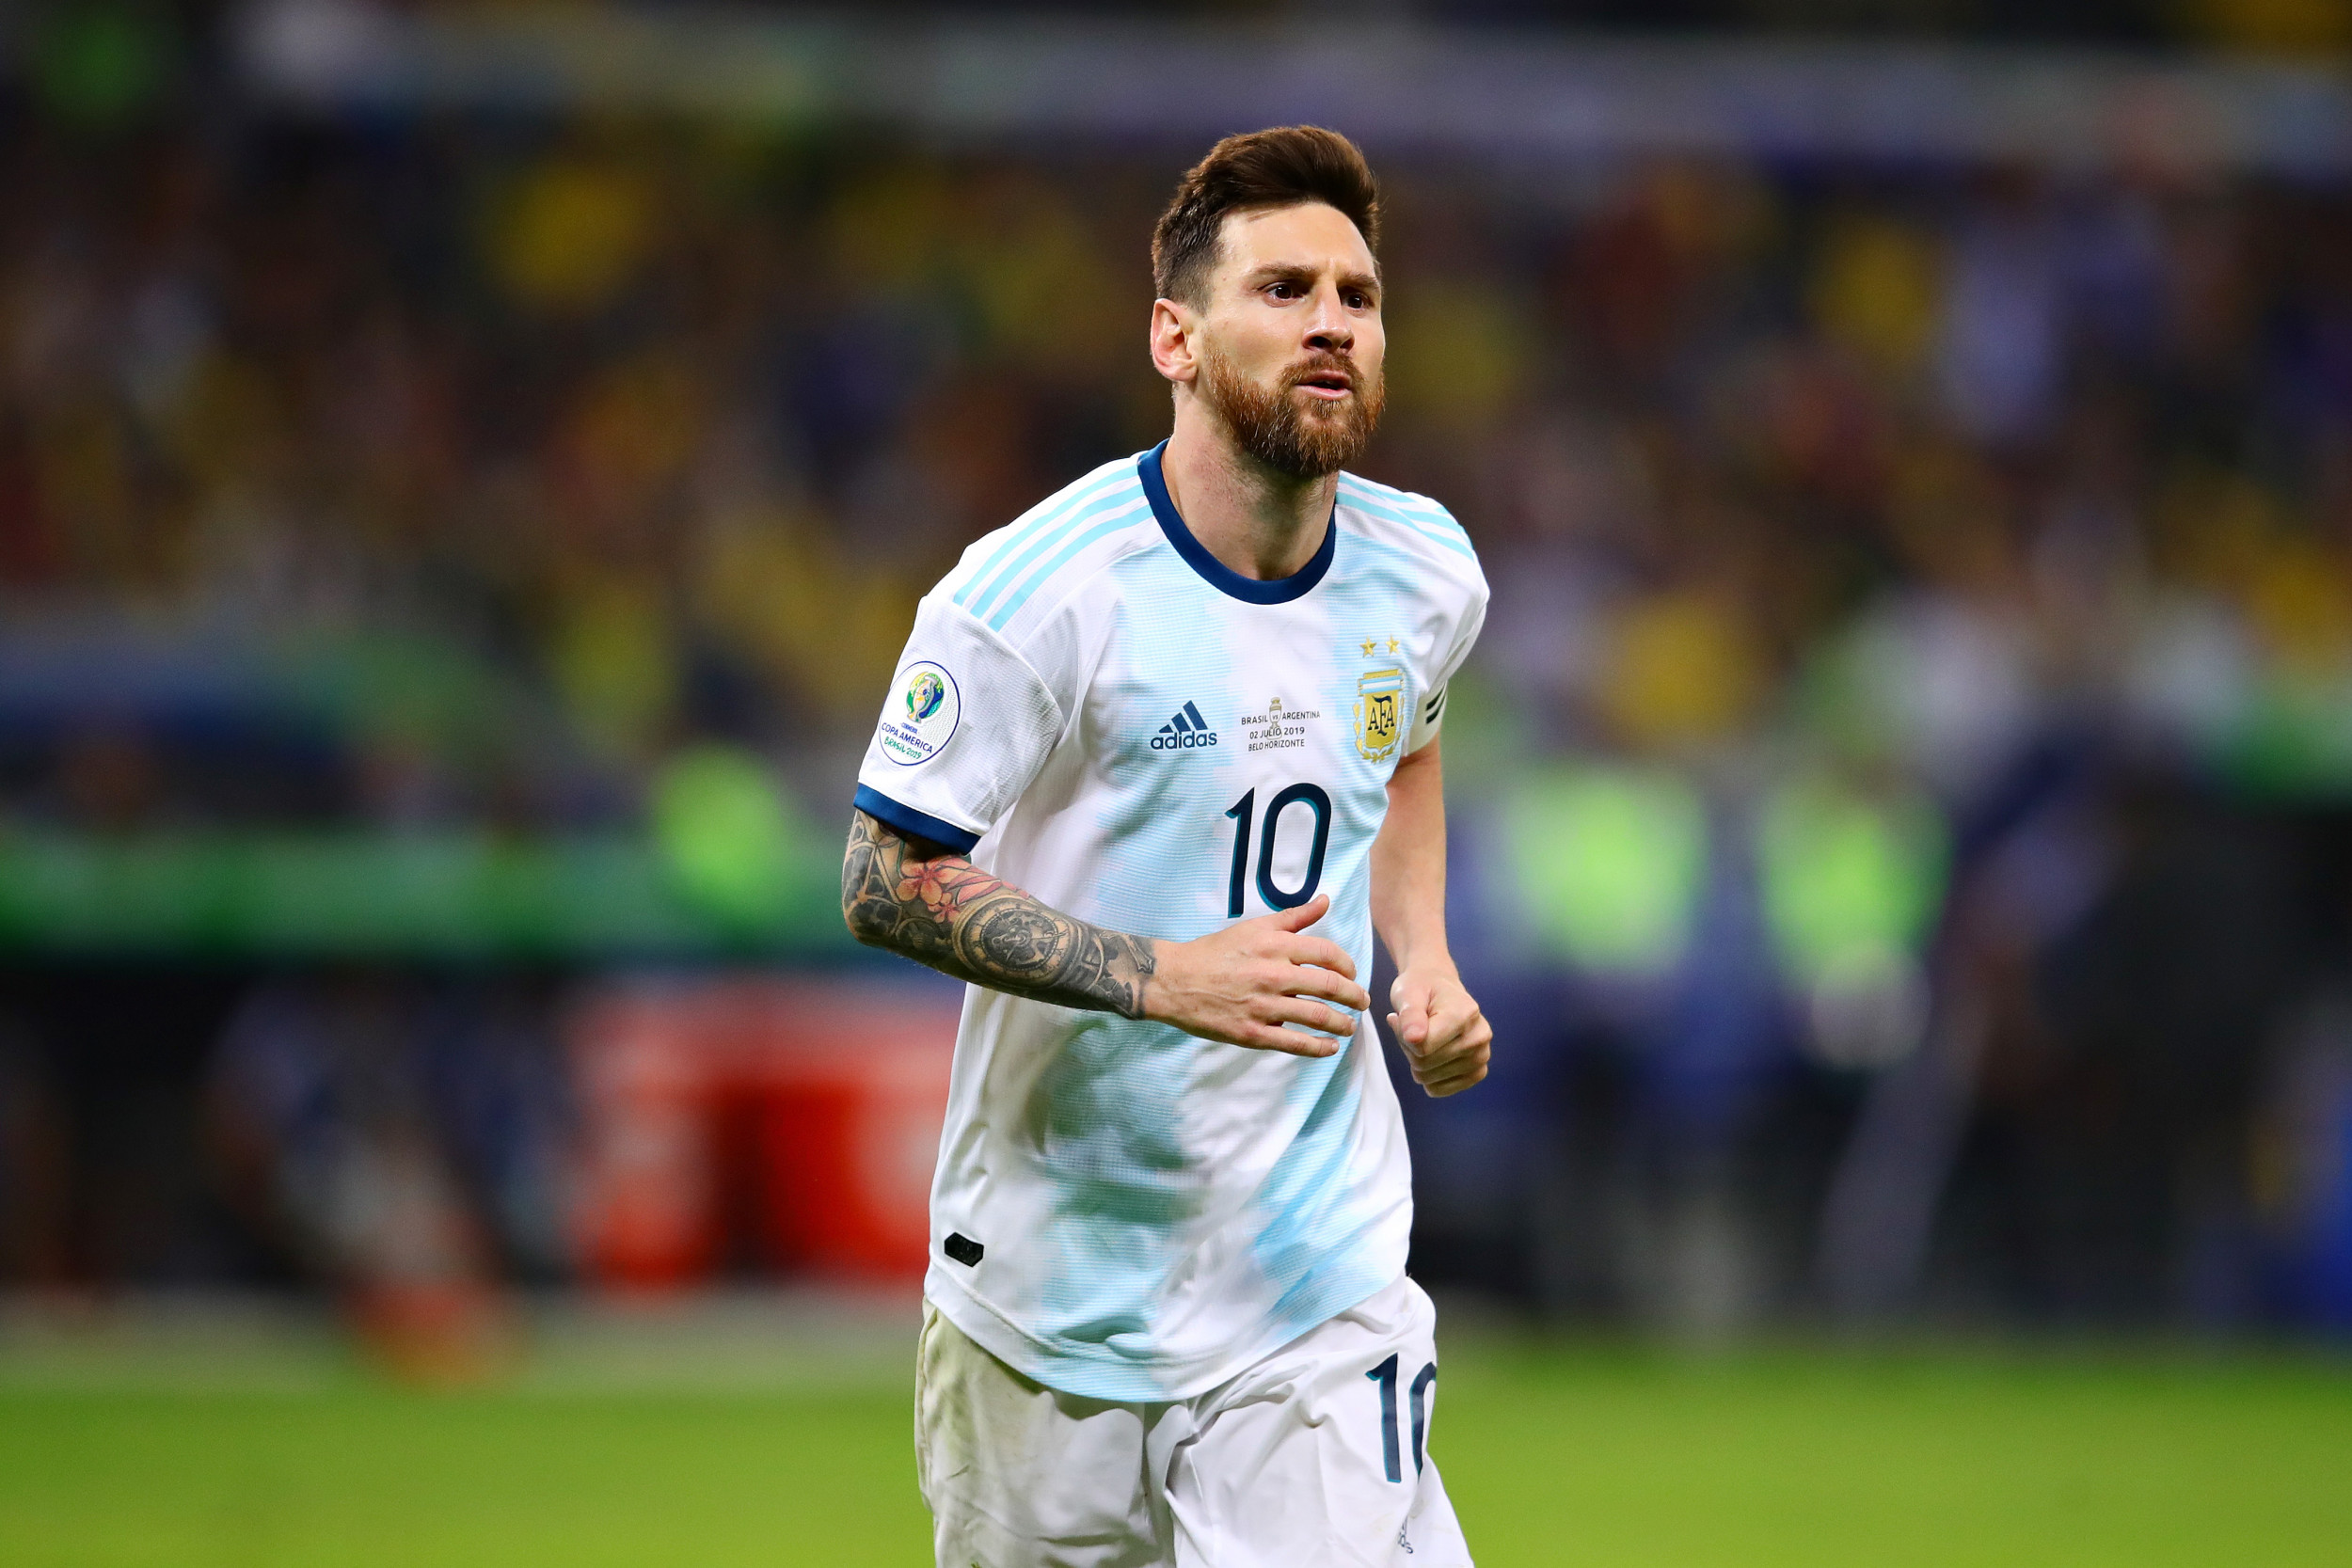 Copa America 2019: Where to watch Argentina vs. Chile, live stream, latest odds, TV schedule